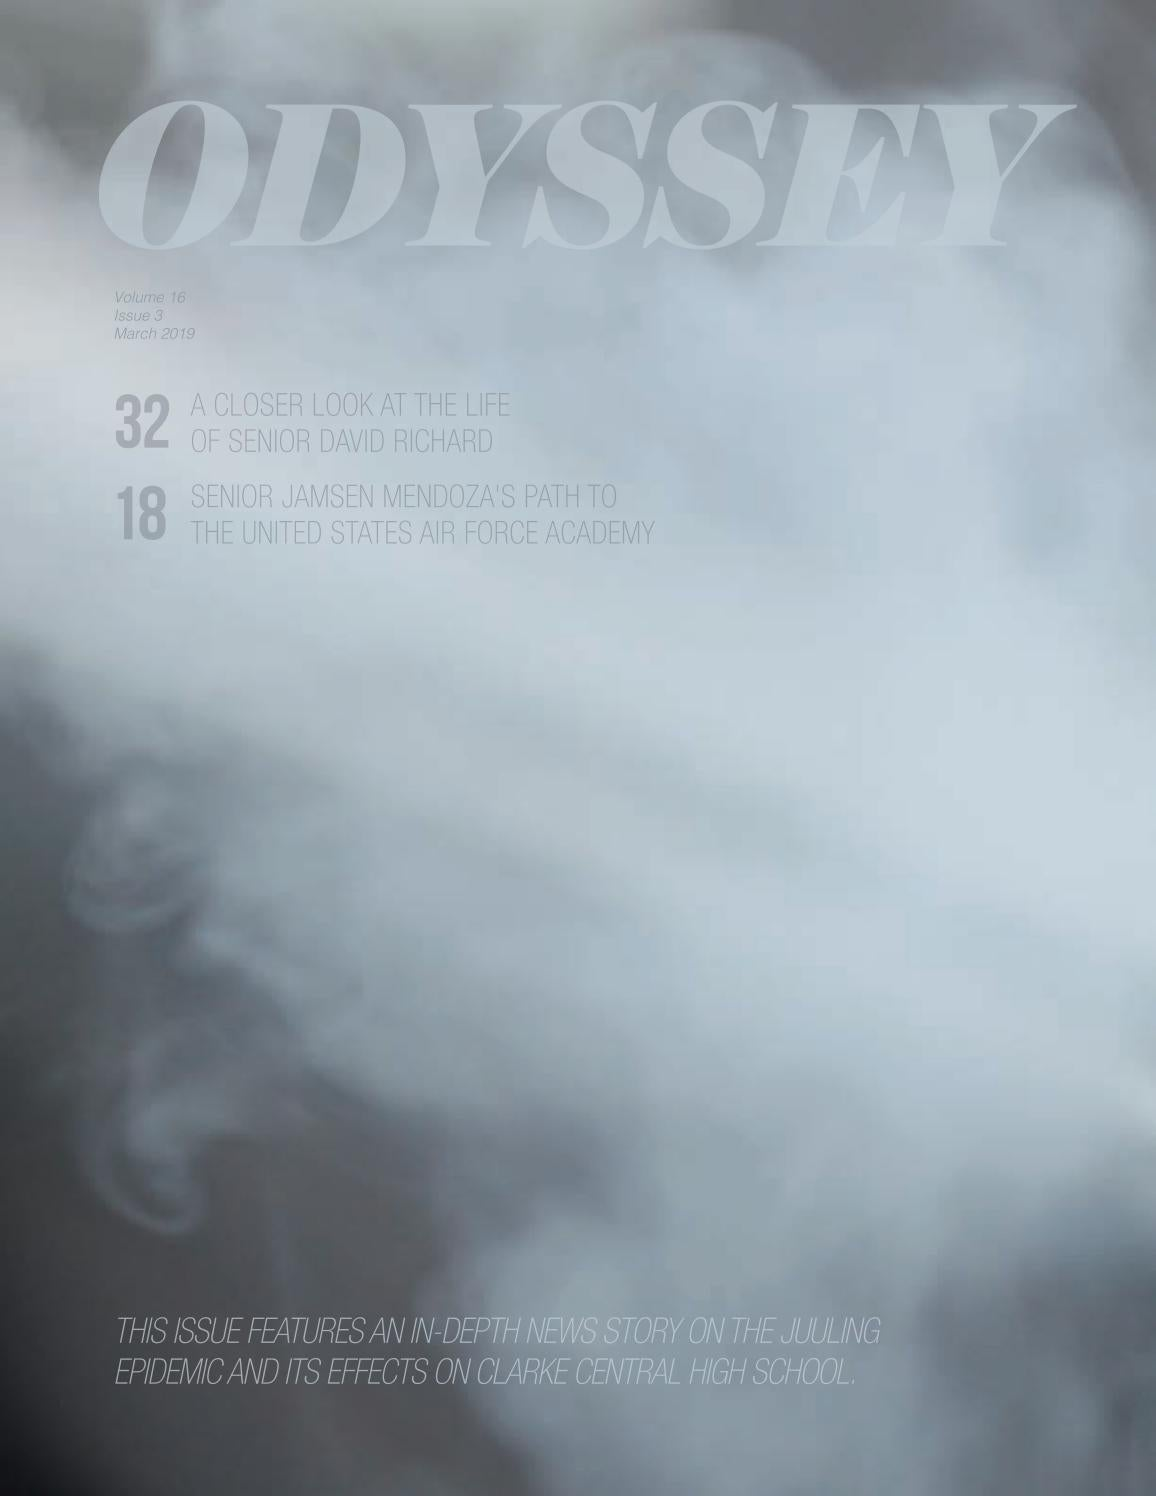 ODYSSEY Newsmagazine, Vol  16, Issue 3, March 2019 by